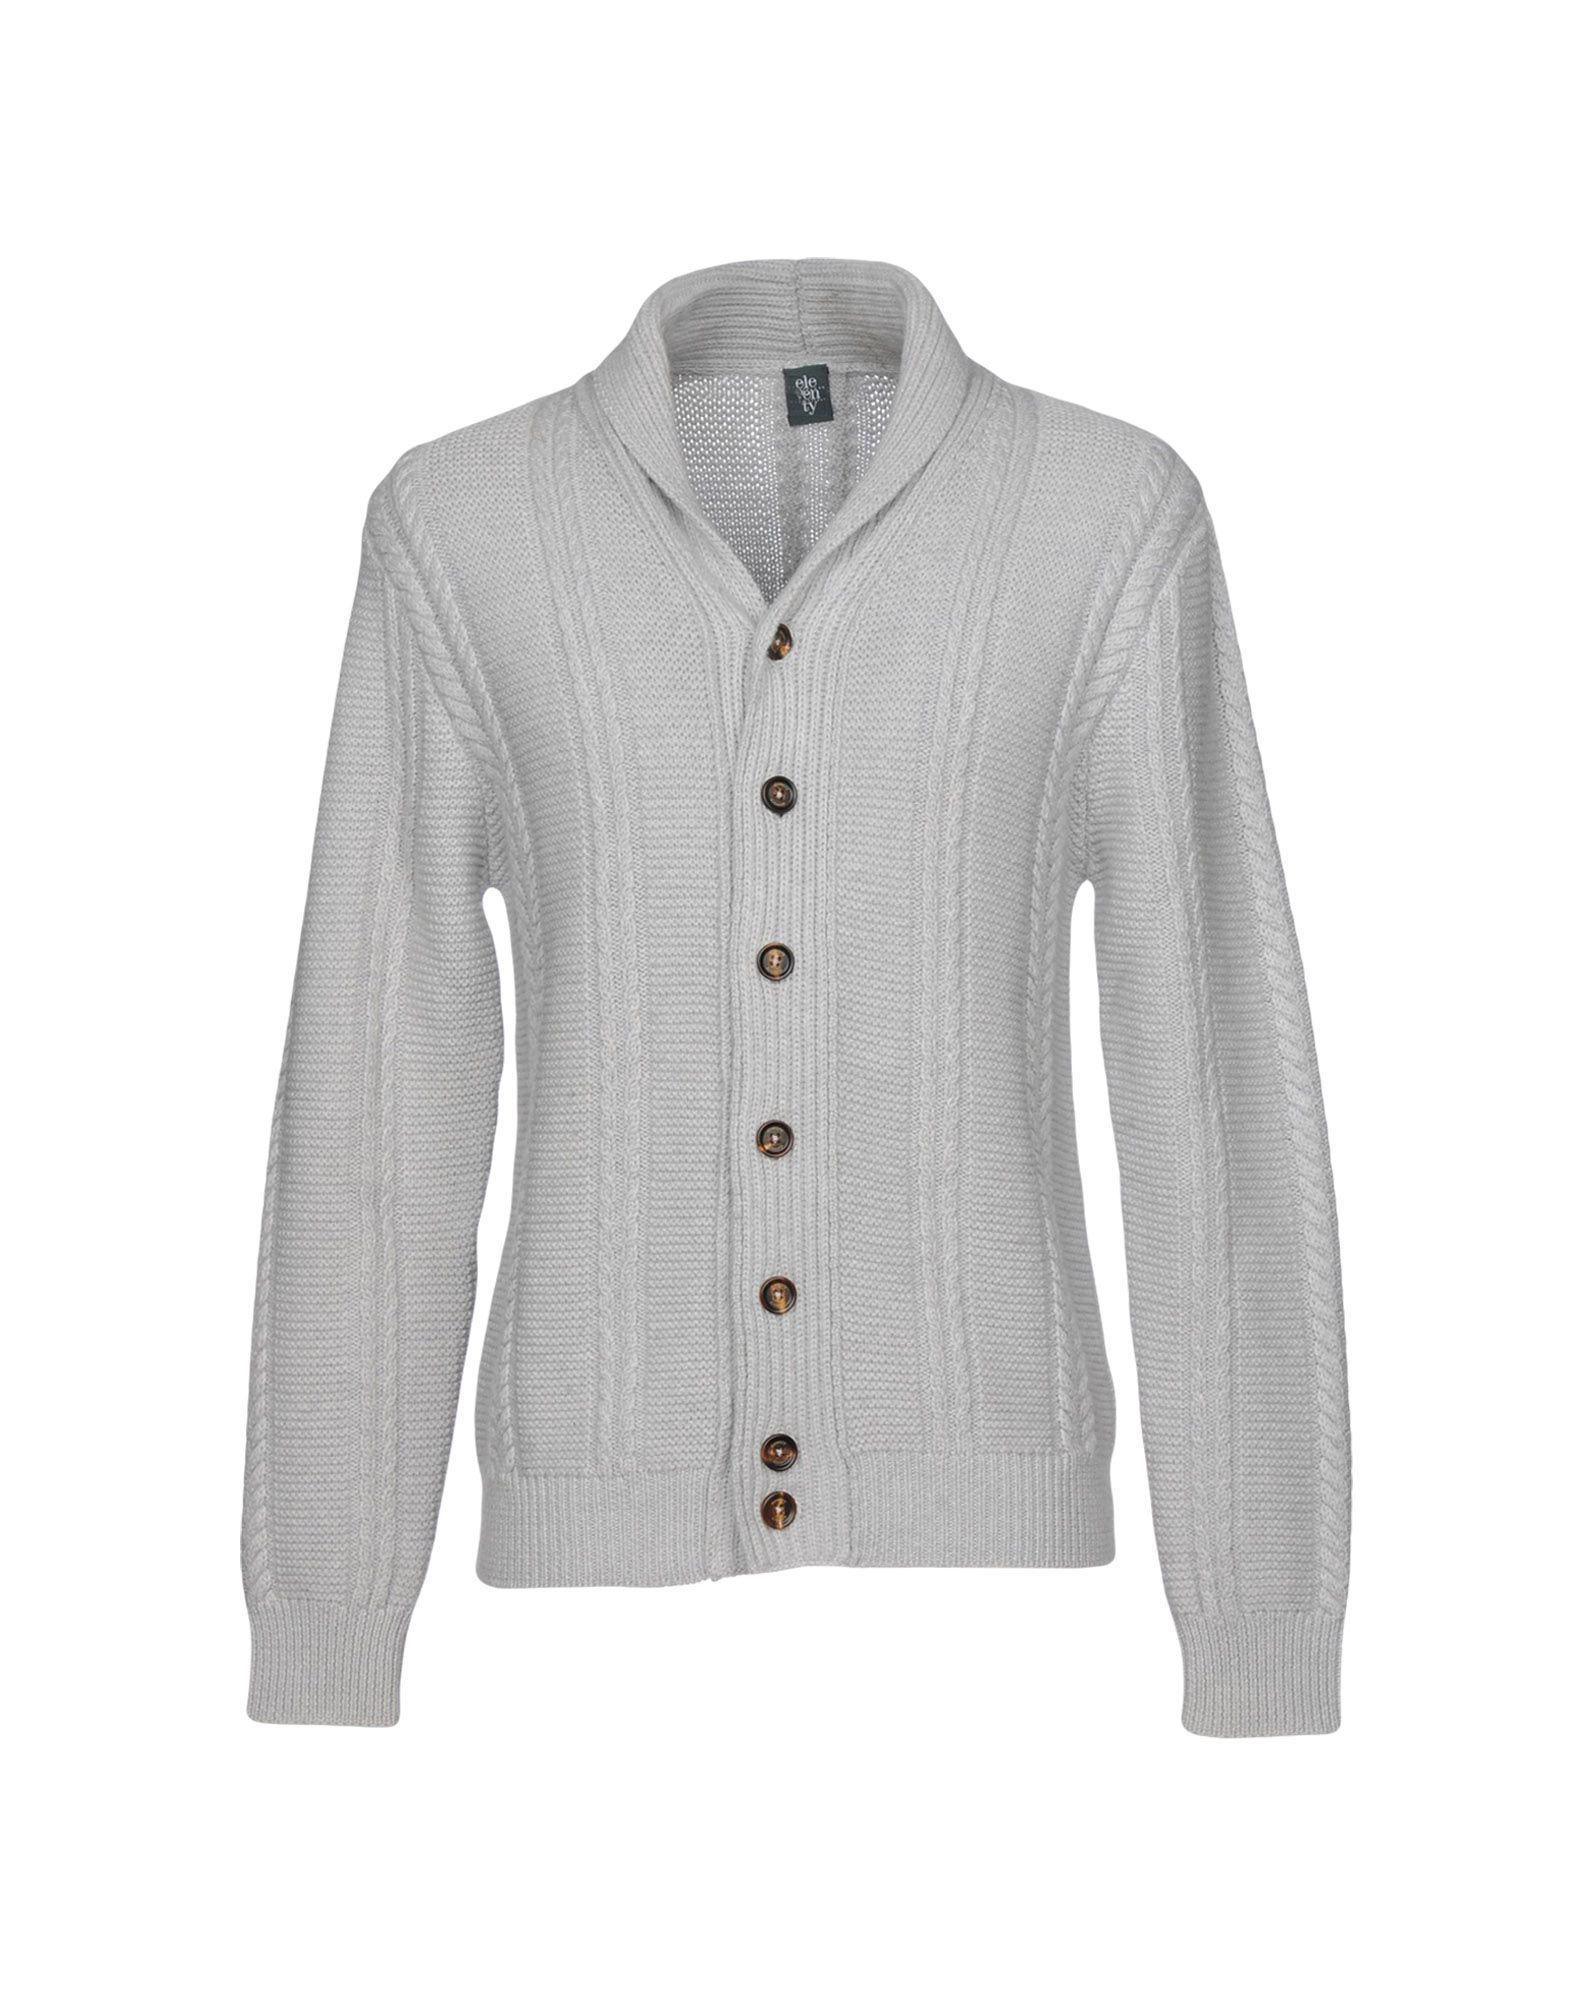 Many Kinds Of Sale Online Latest Sale Online Cashmere cardigan light grey Eleventy Free Shipping Sast cN7fNwH